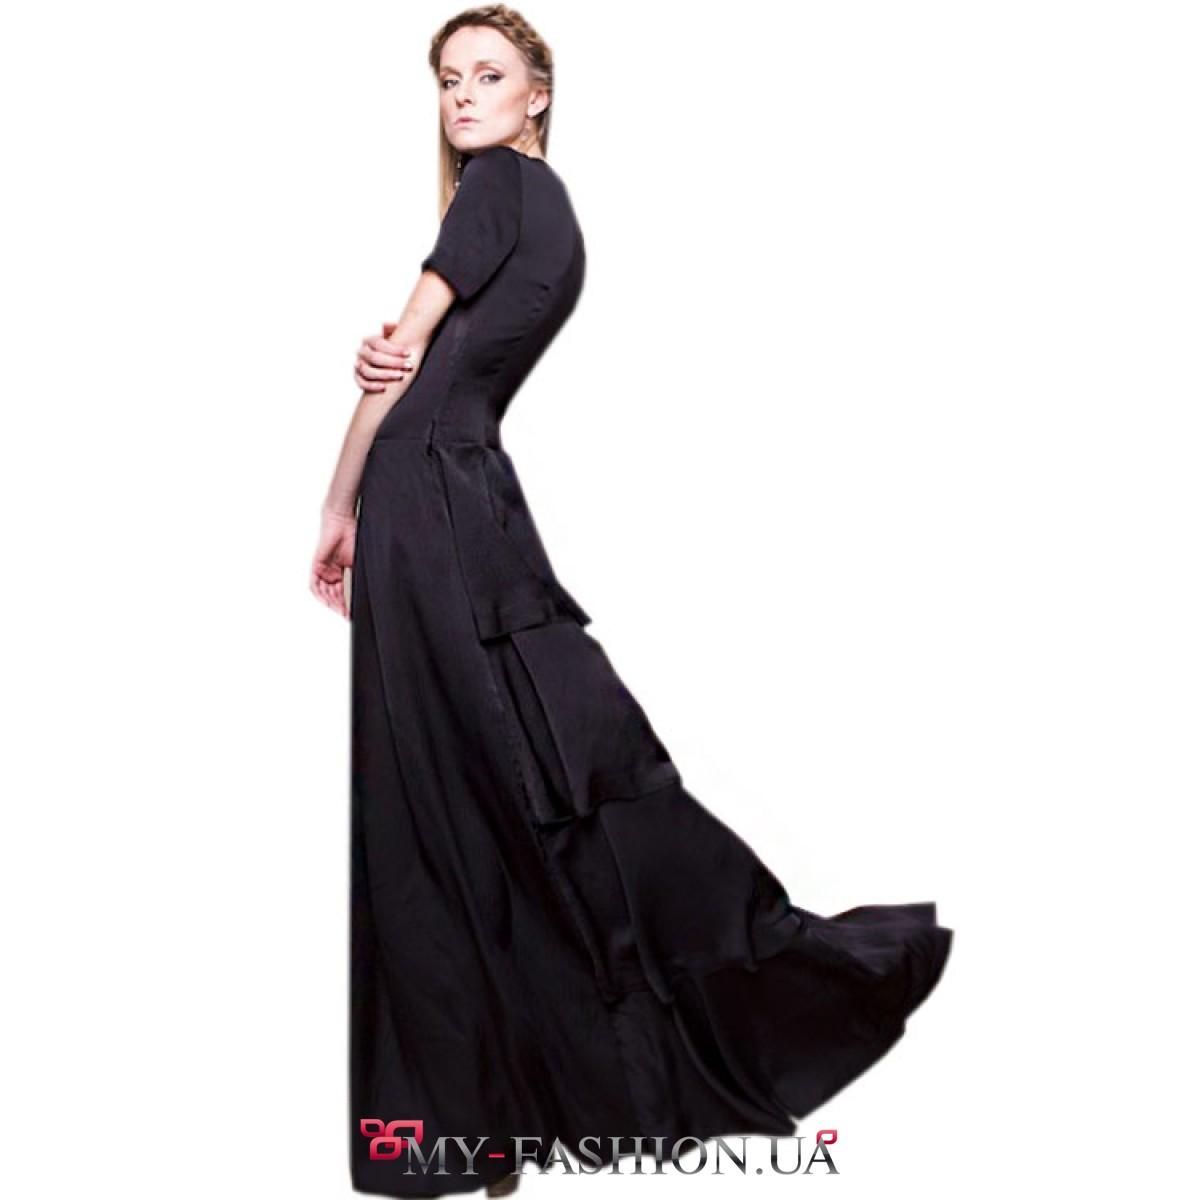 Мода юбки доставка